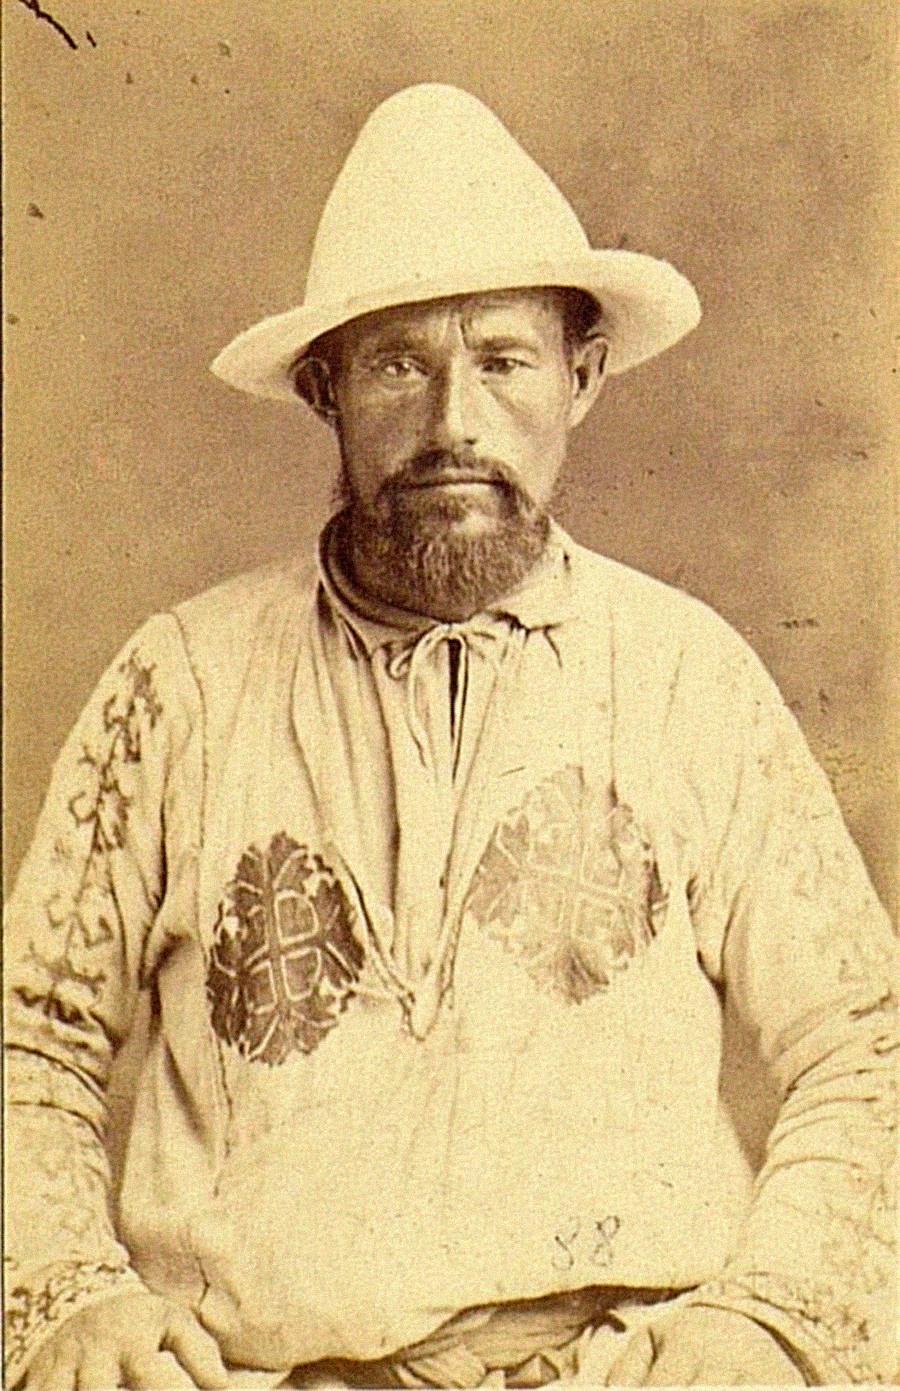 Татарин из Казањске губерније (данас Република Татарстан), 1880.